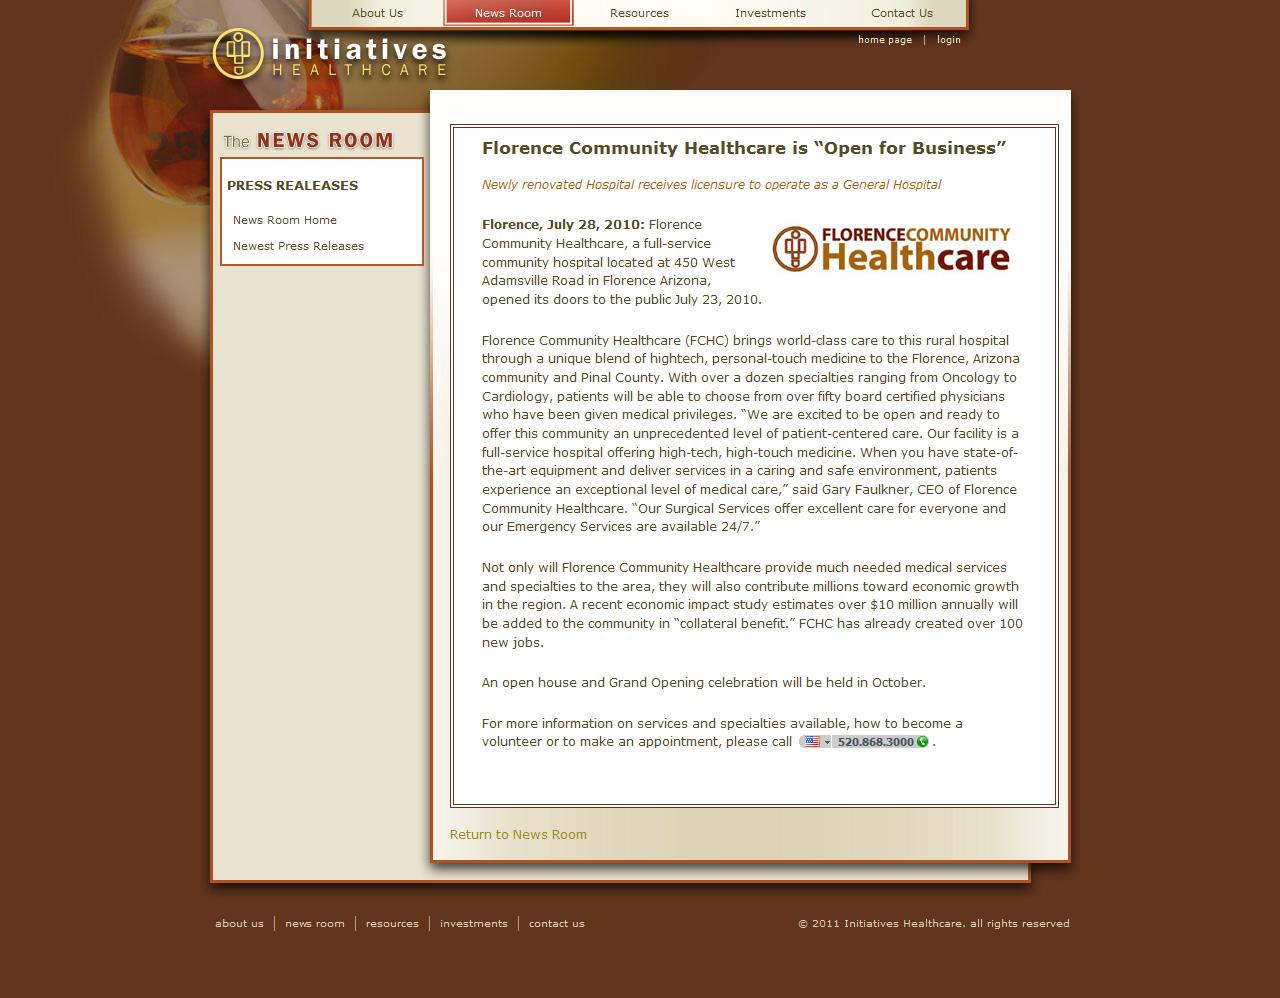 Initiatives-Healthcare_3